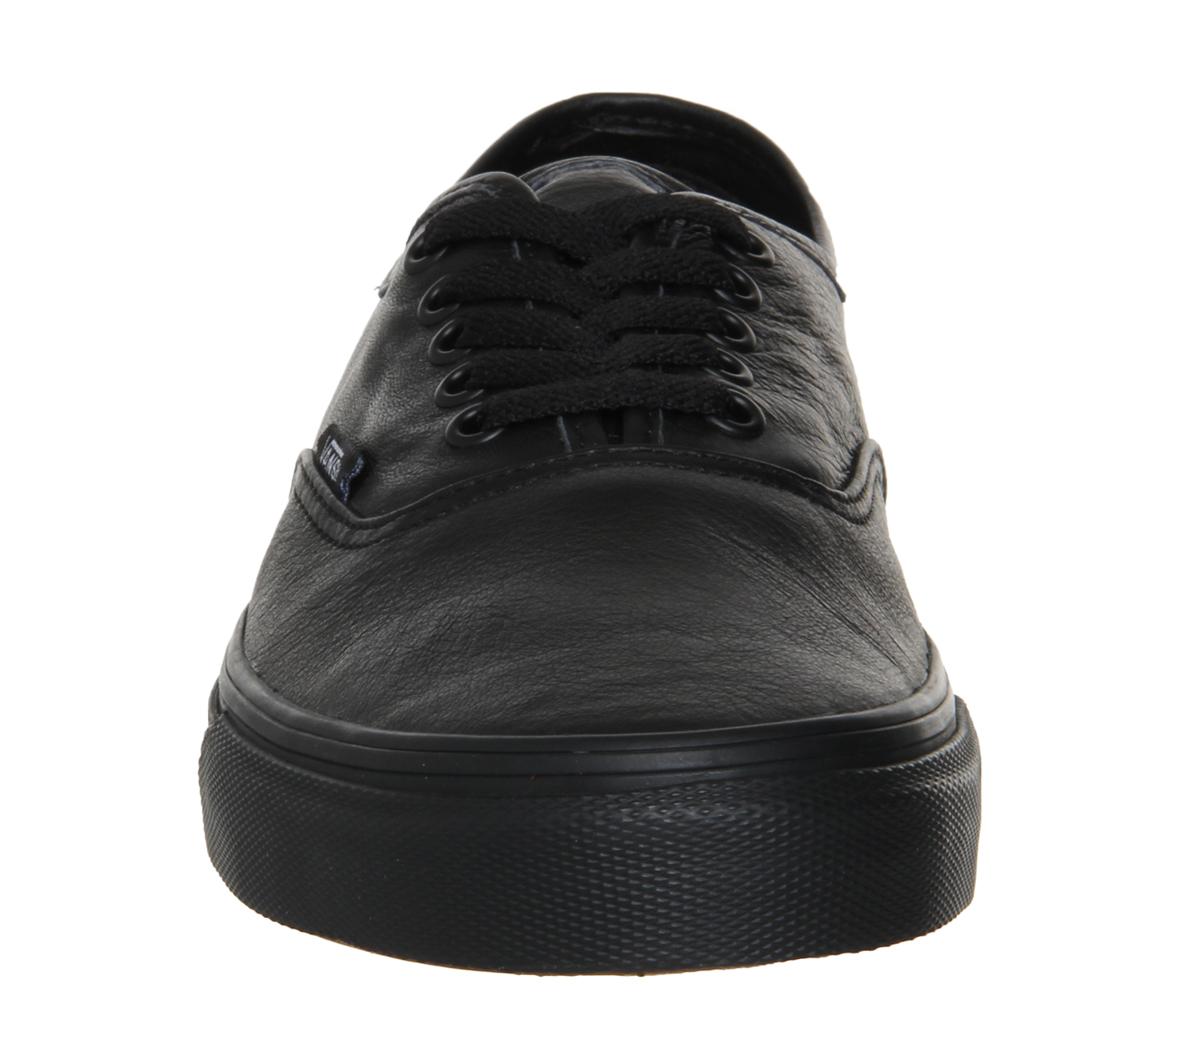 Details about Mens Vans Authentic Leather Black Mono Trainers Shoes feeb28b8b